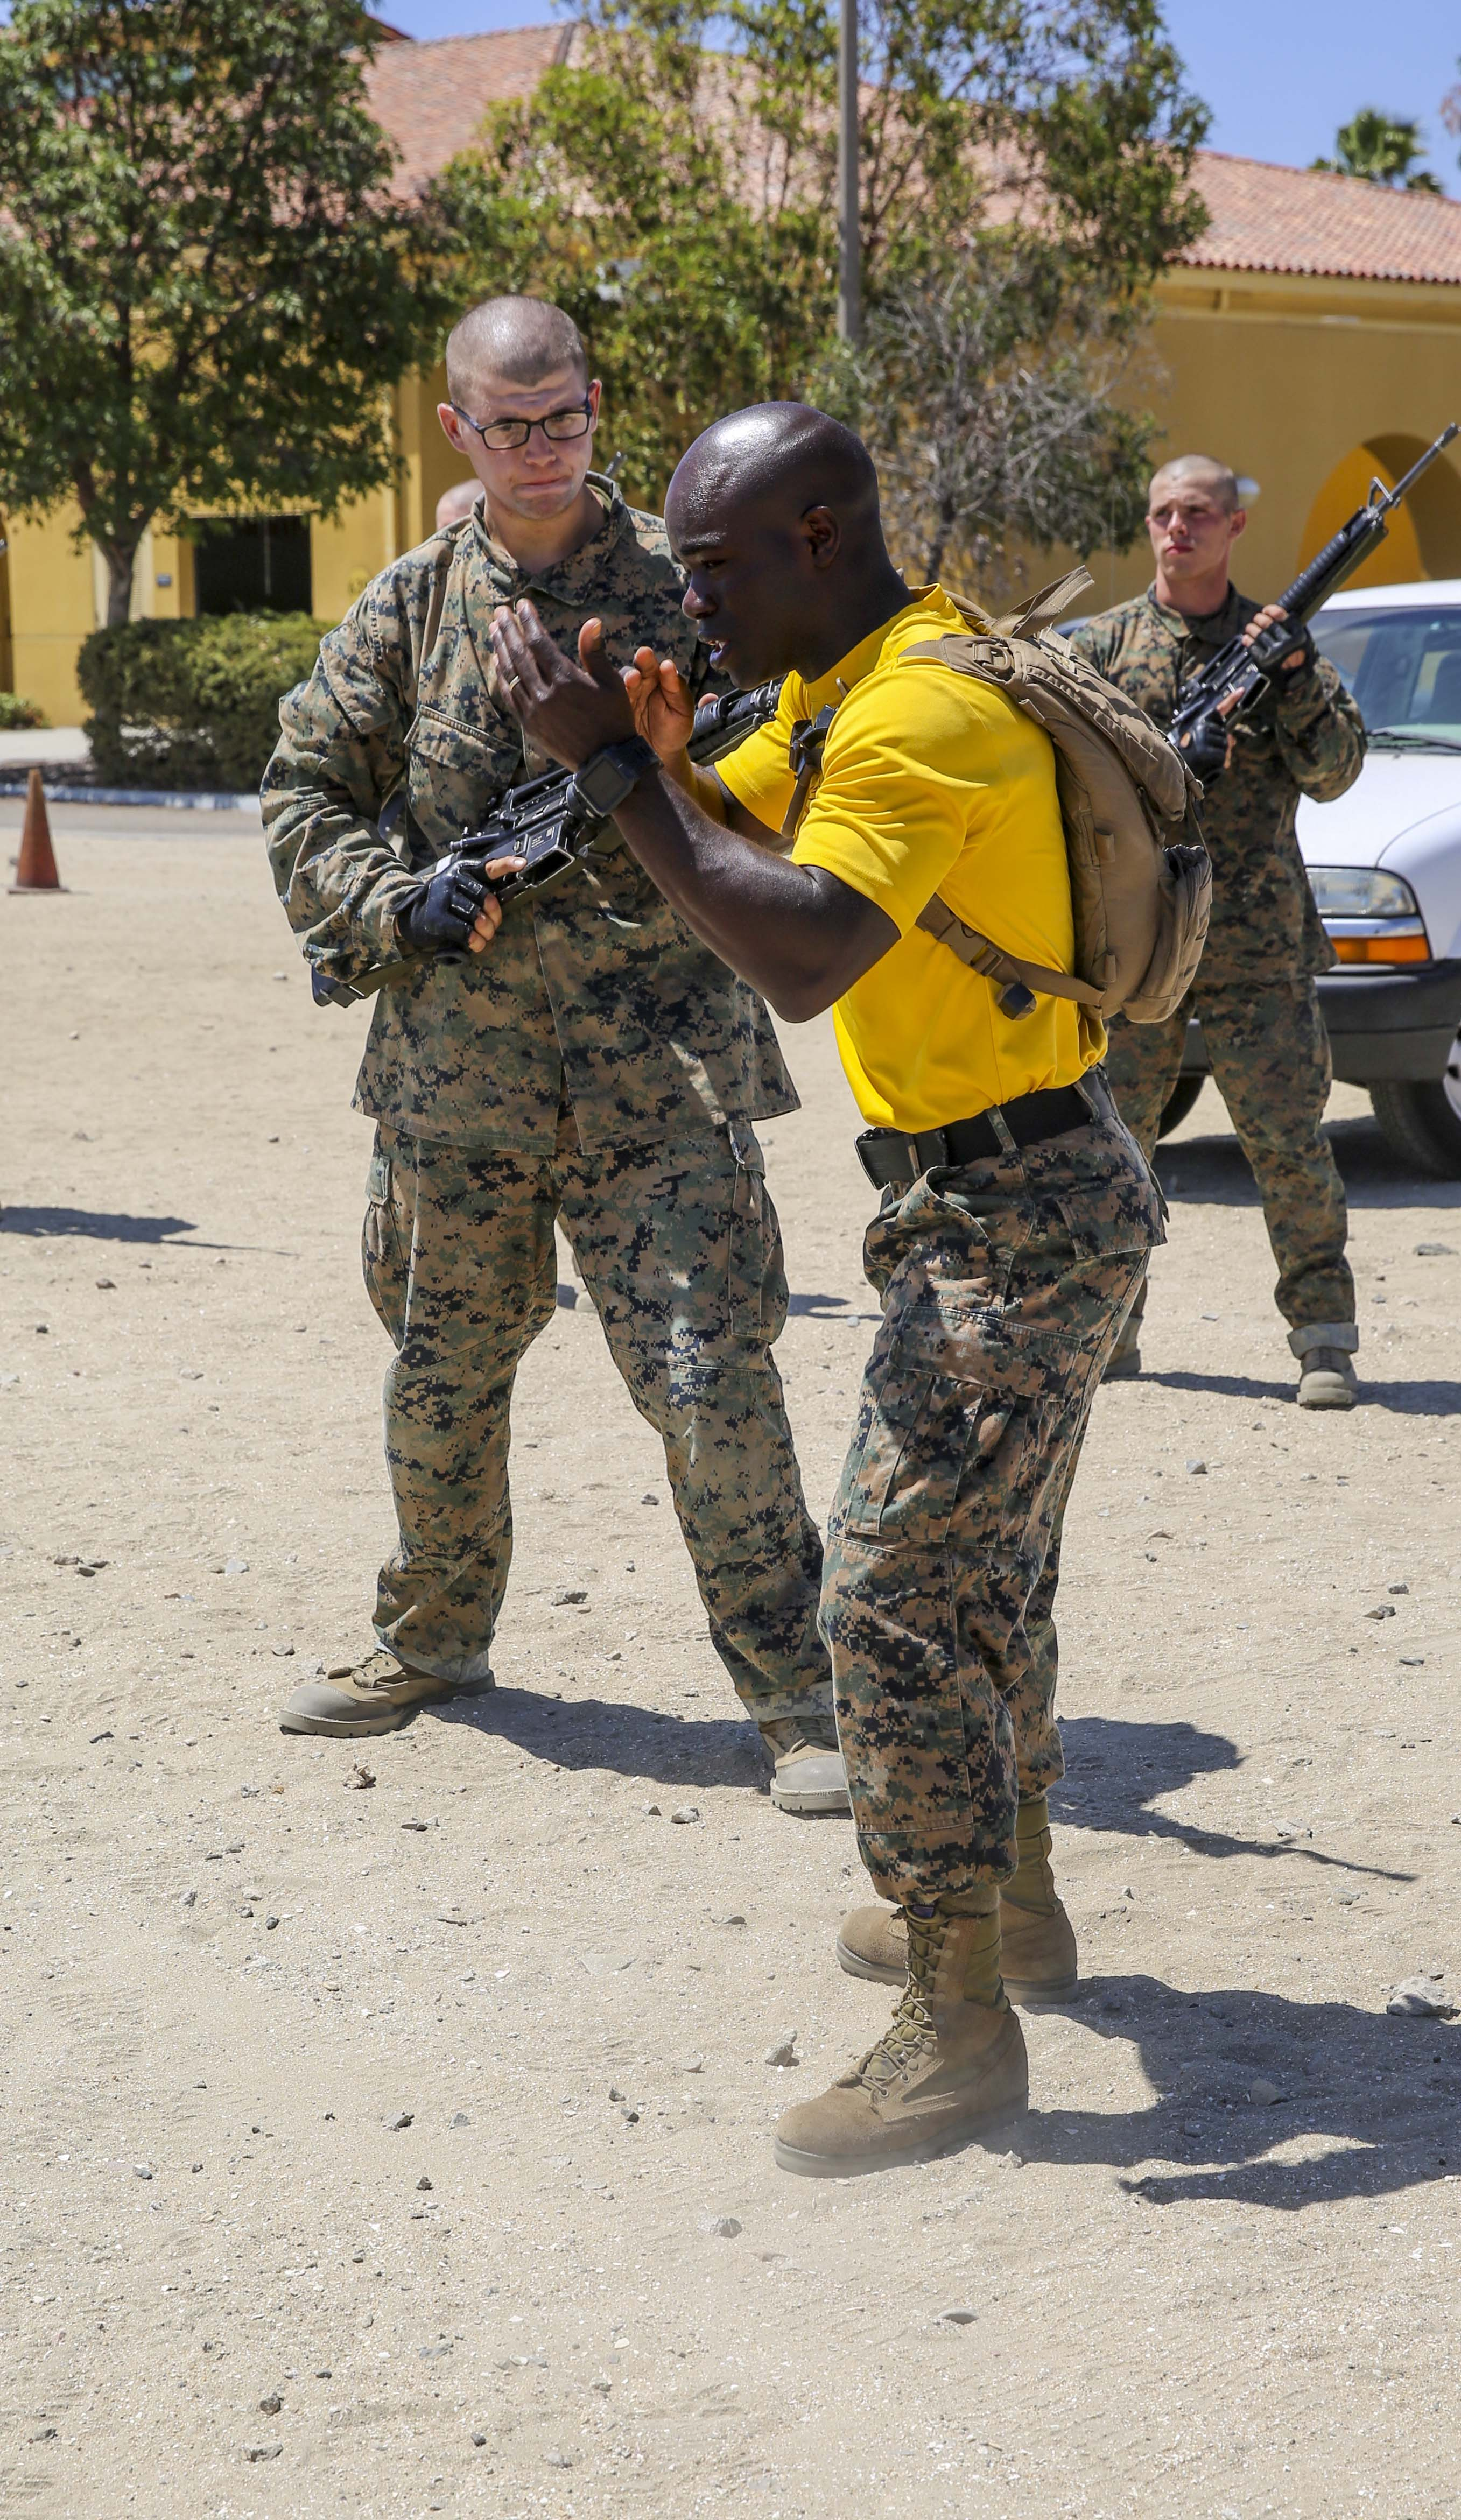 Dating a marine in san diego